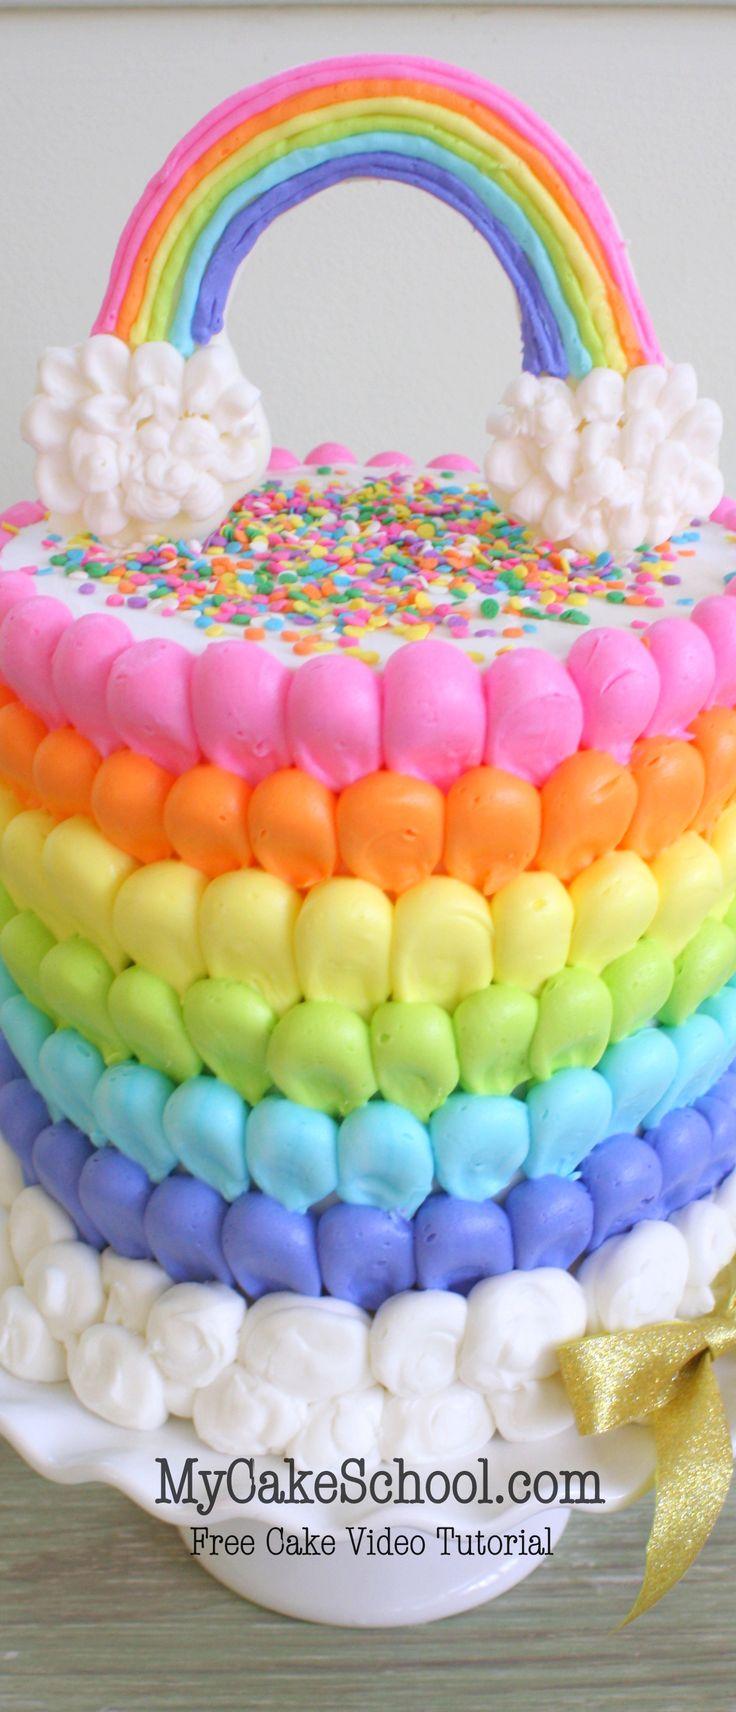 adorable puffed rainbow buttercream cake decorating video free tutorial by mycakeschoolcom - Decorating Cakes